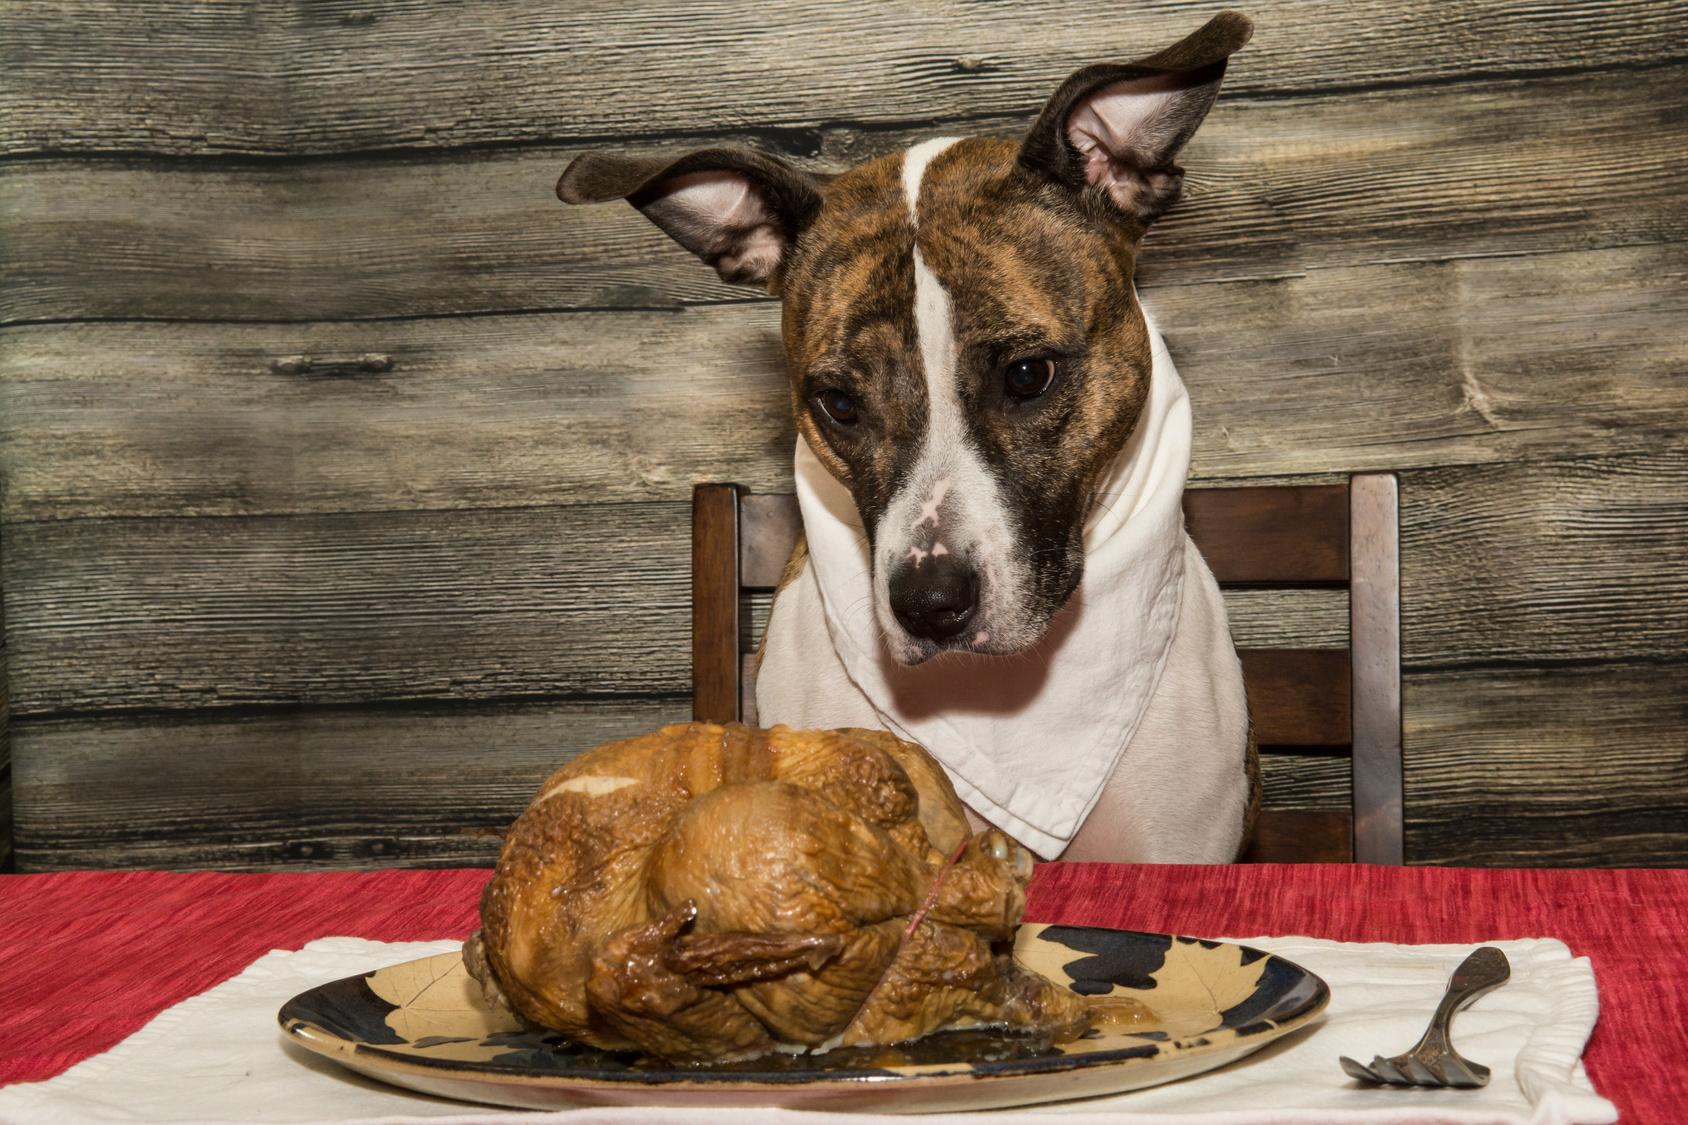 feeding your dog the holiday turkey - dog health - turkey - thanksgiving - holiday - holiday season - pets - dogs - an organic conversation - helge hellberg - education - inspiration - green living - green media